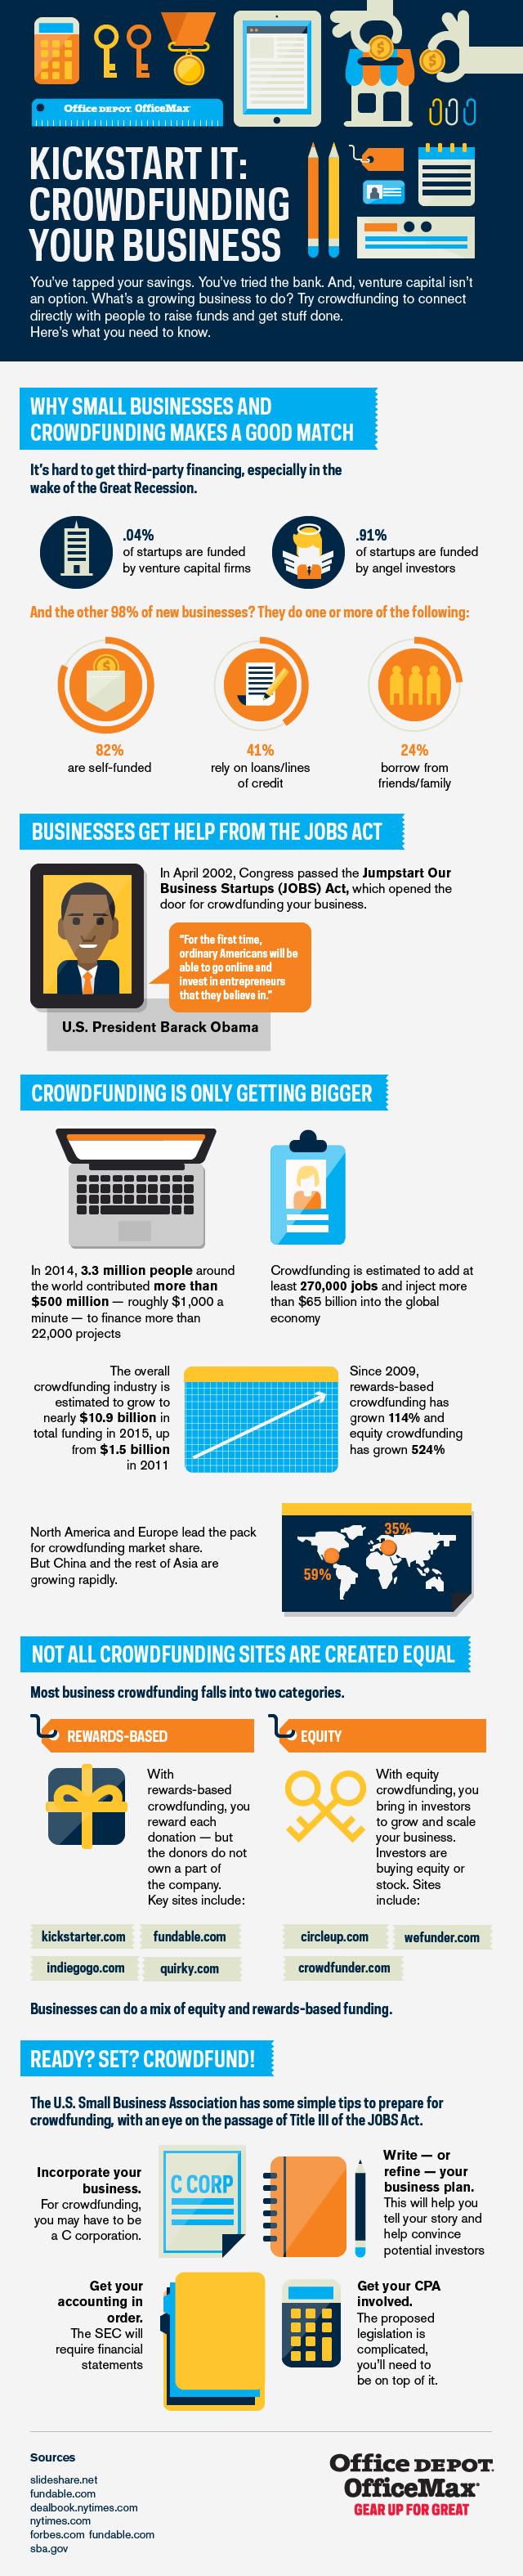 Kickstart It Crowdfunding Your Business Infographic